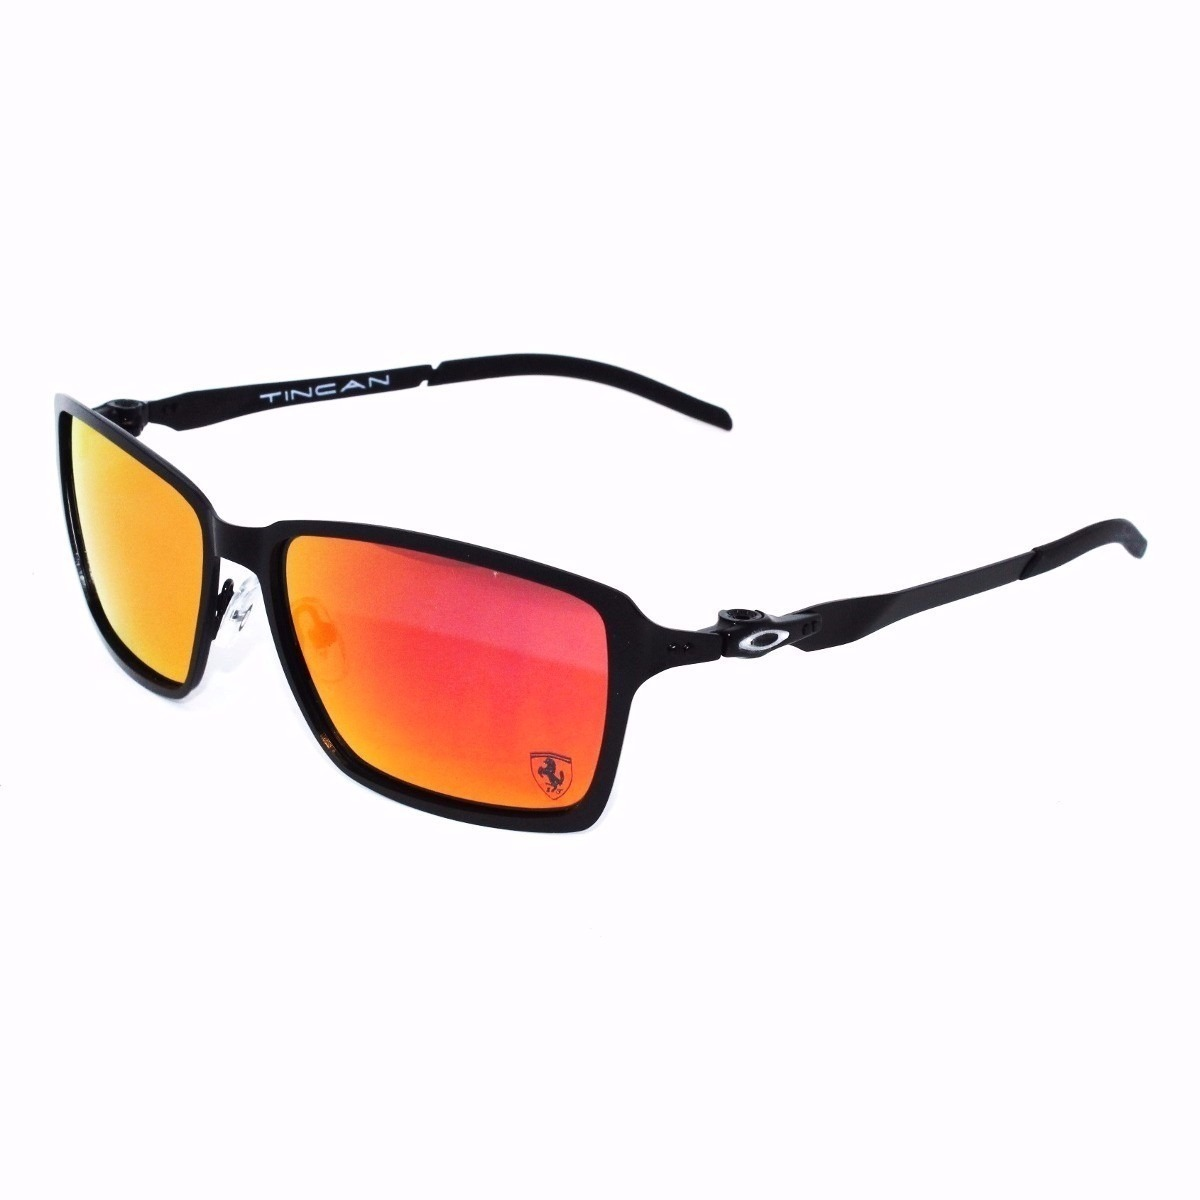 ebdc00910 óculos oakley tincan ferrari masculino polarizado promoção!! Carregando  zoom.